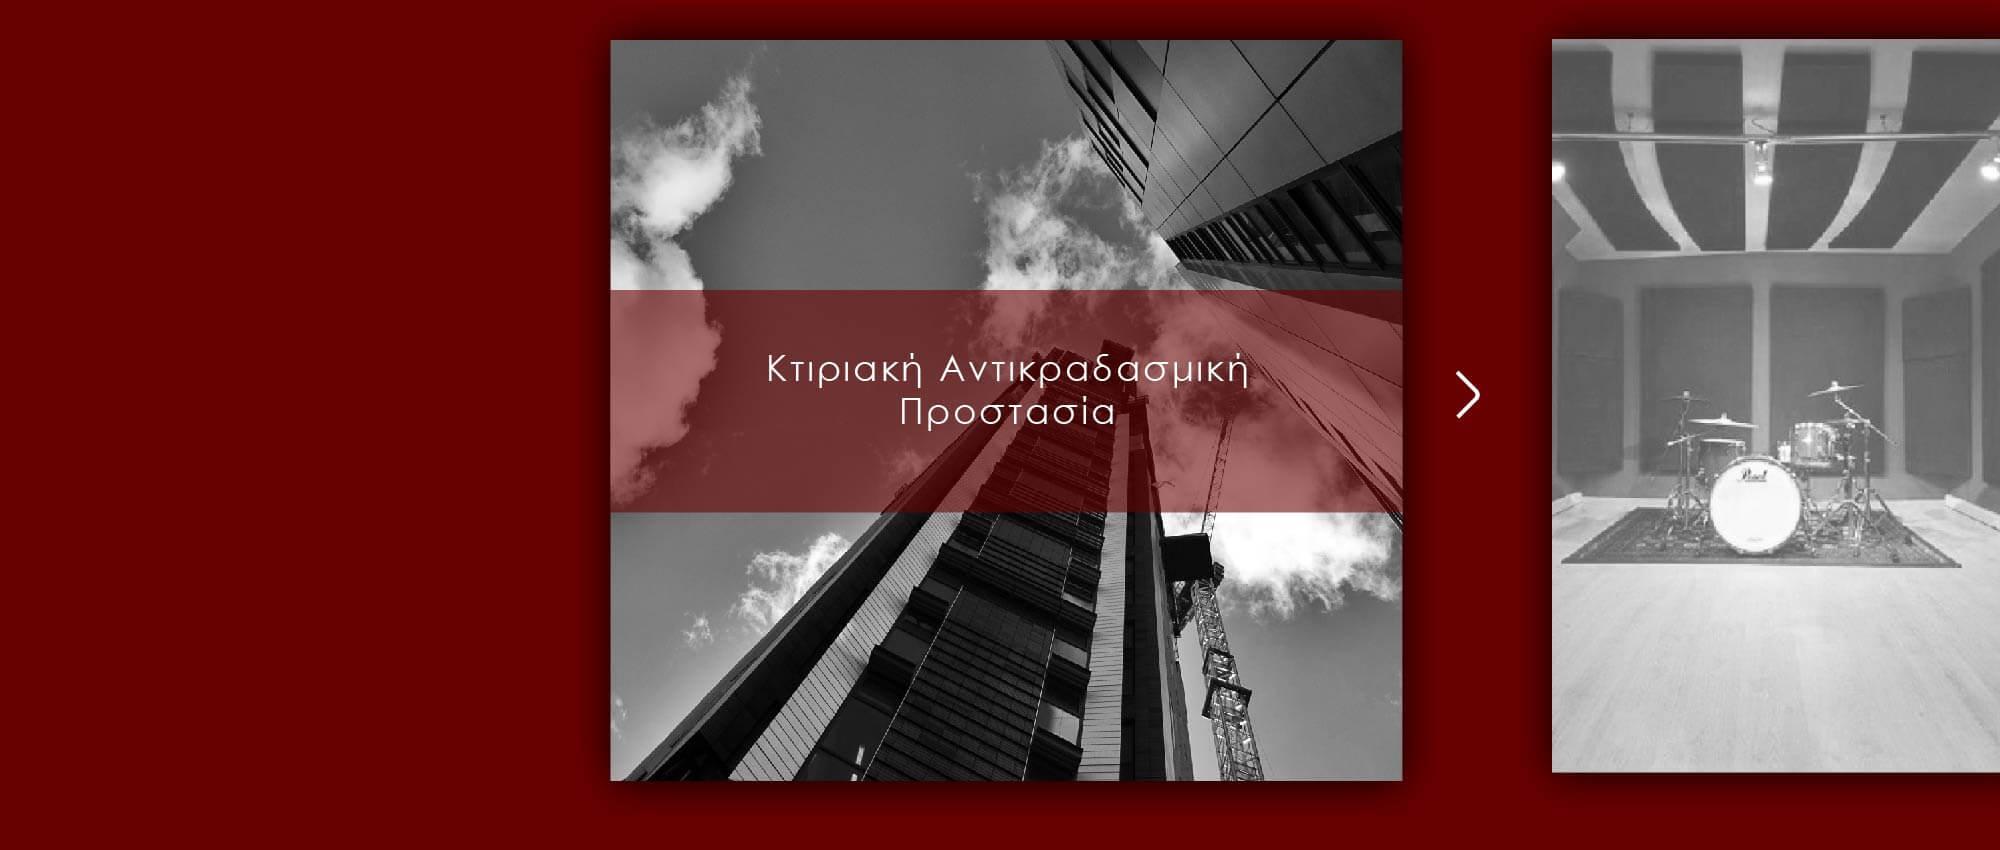 antivibration-systems-Κτιριακή Αντικραδασμική Προστασία